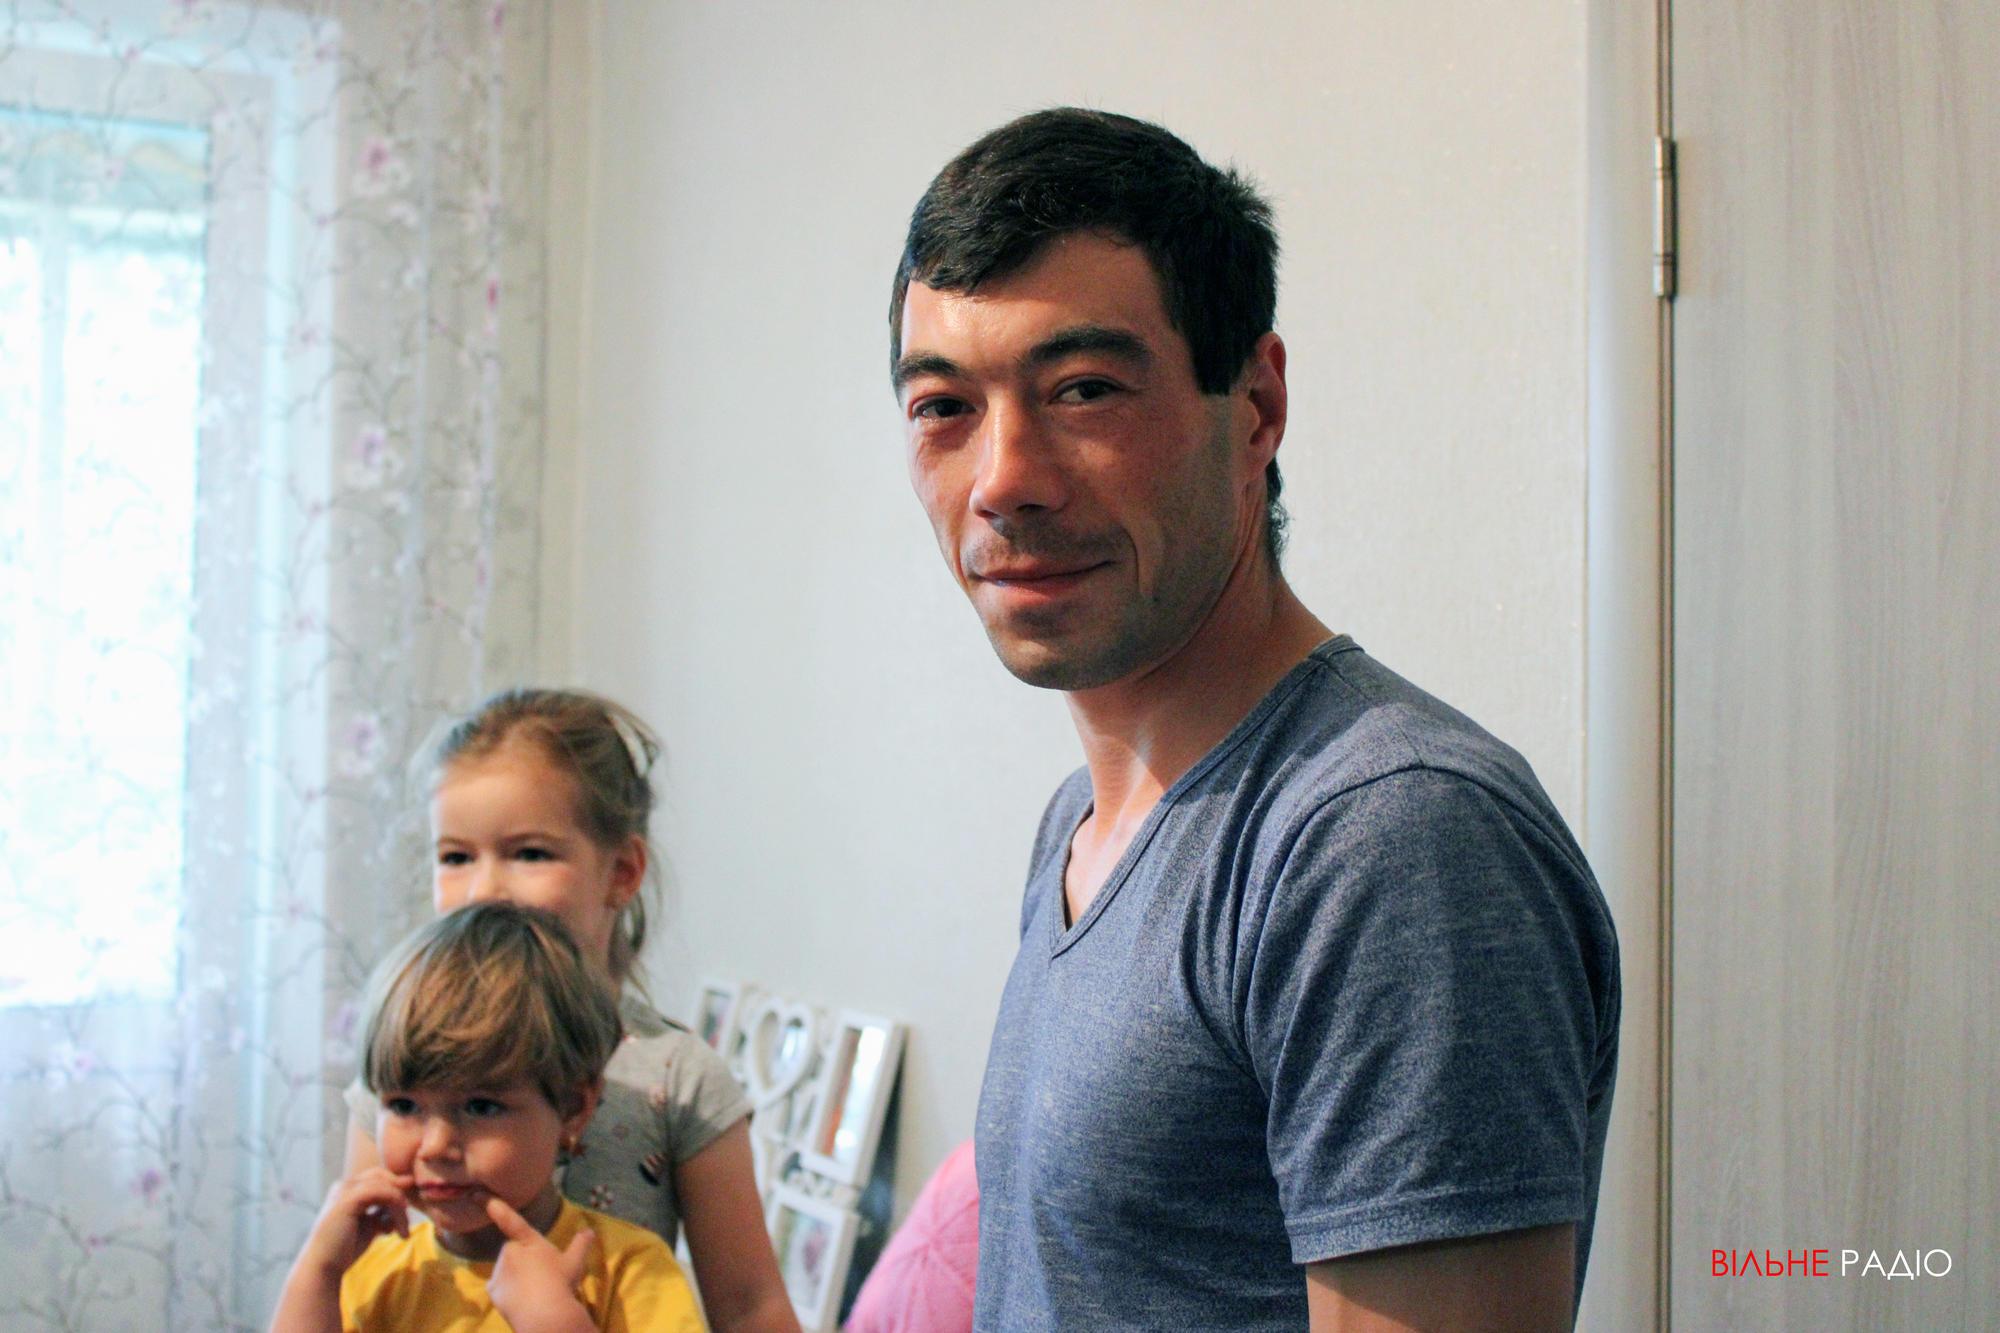 Ярослав Романчук, переехавший из прифронтового Майорска в поселок под Бахмутом